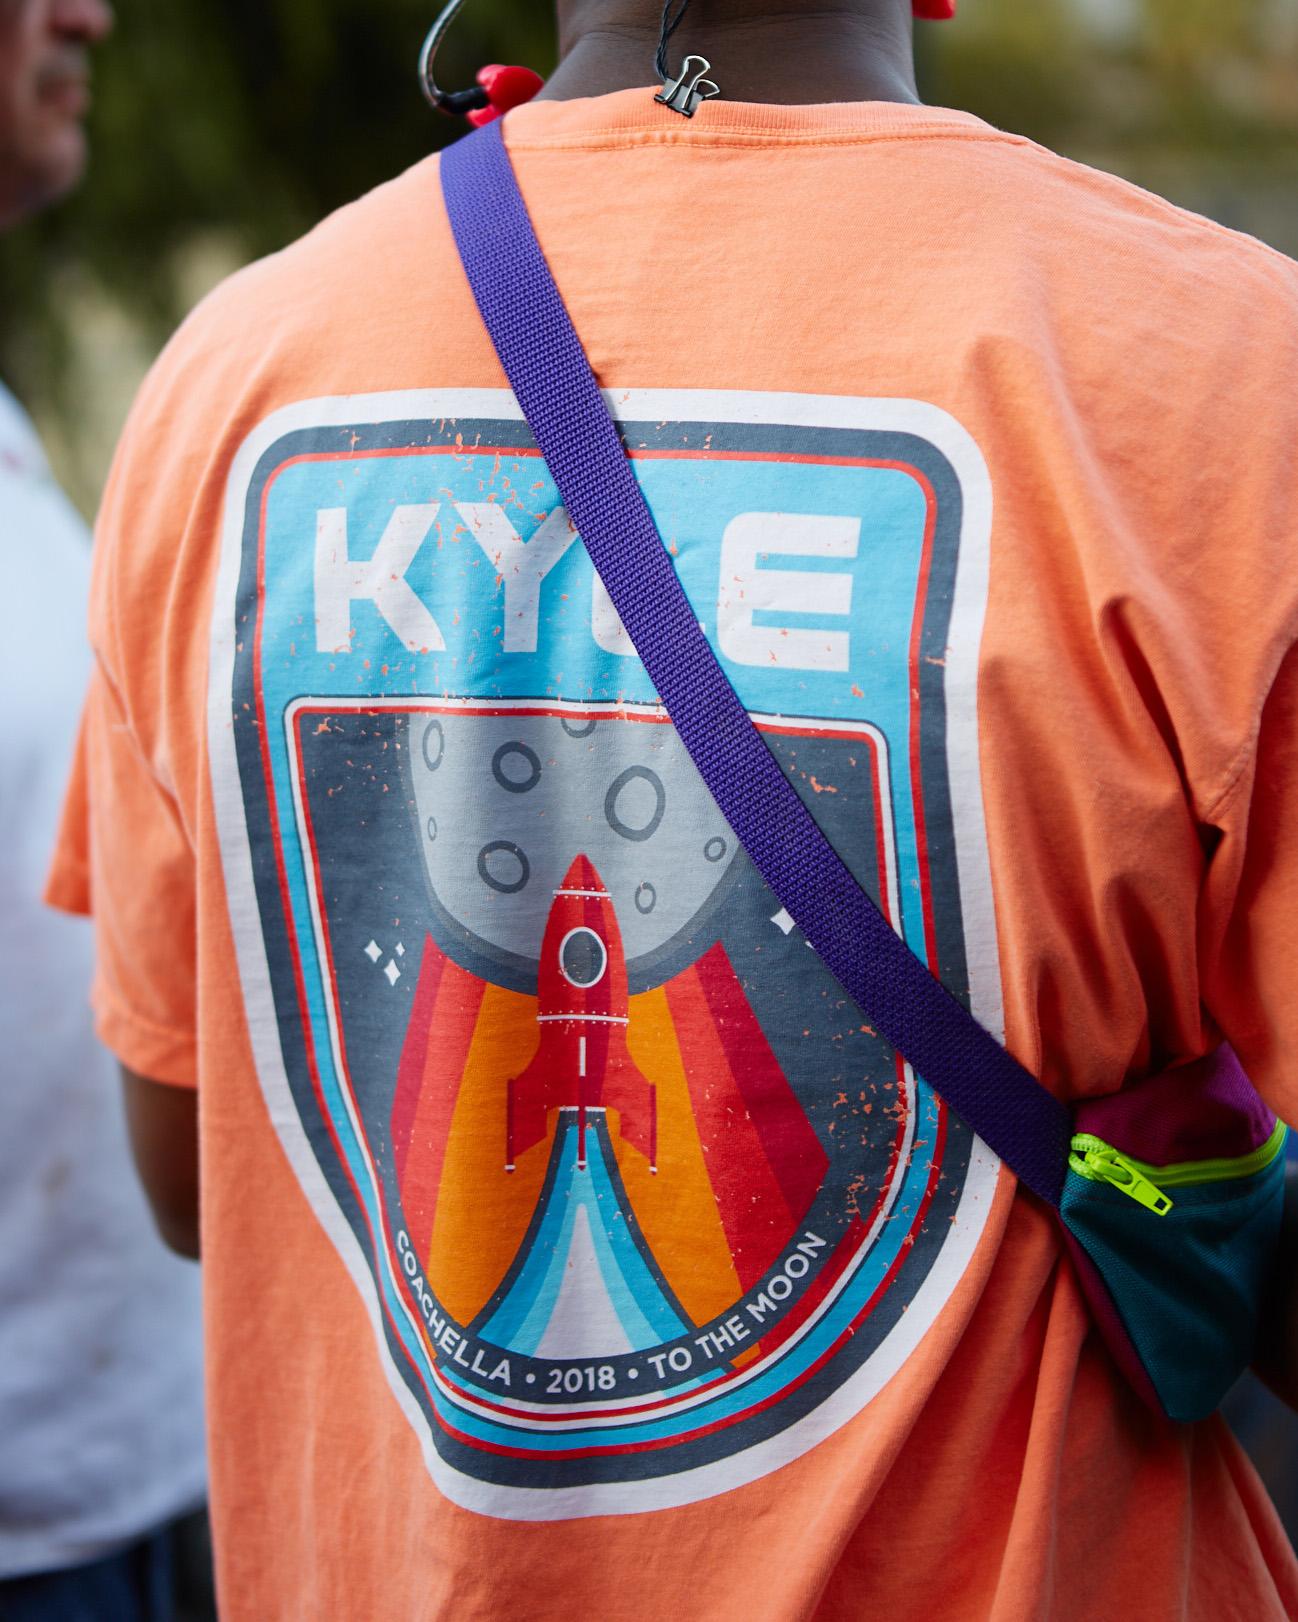 KYLE Coachella 2018